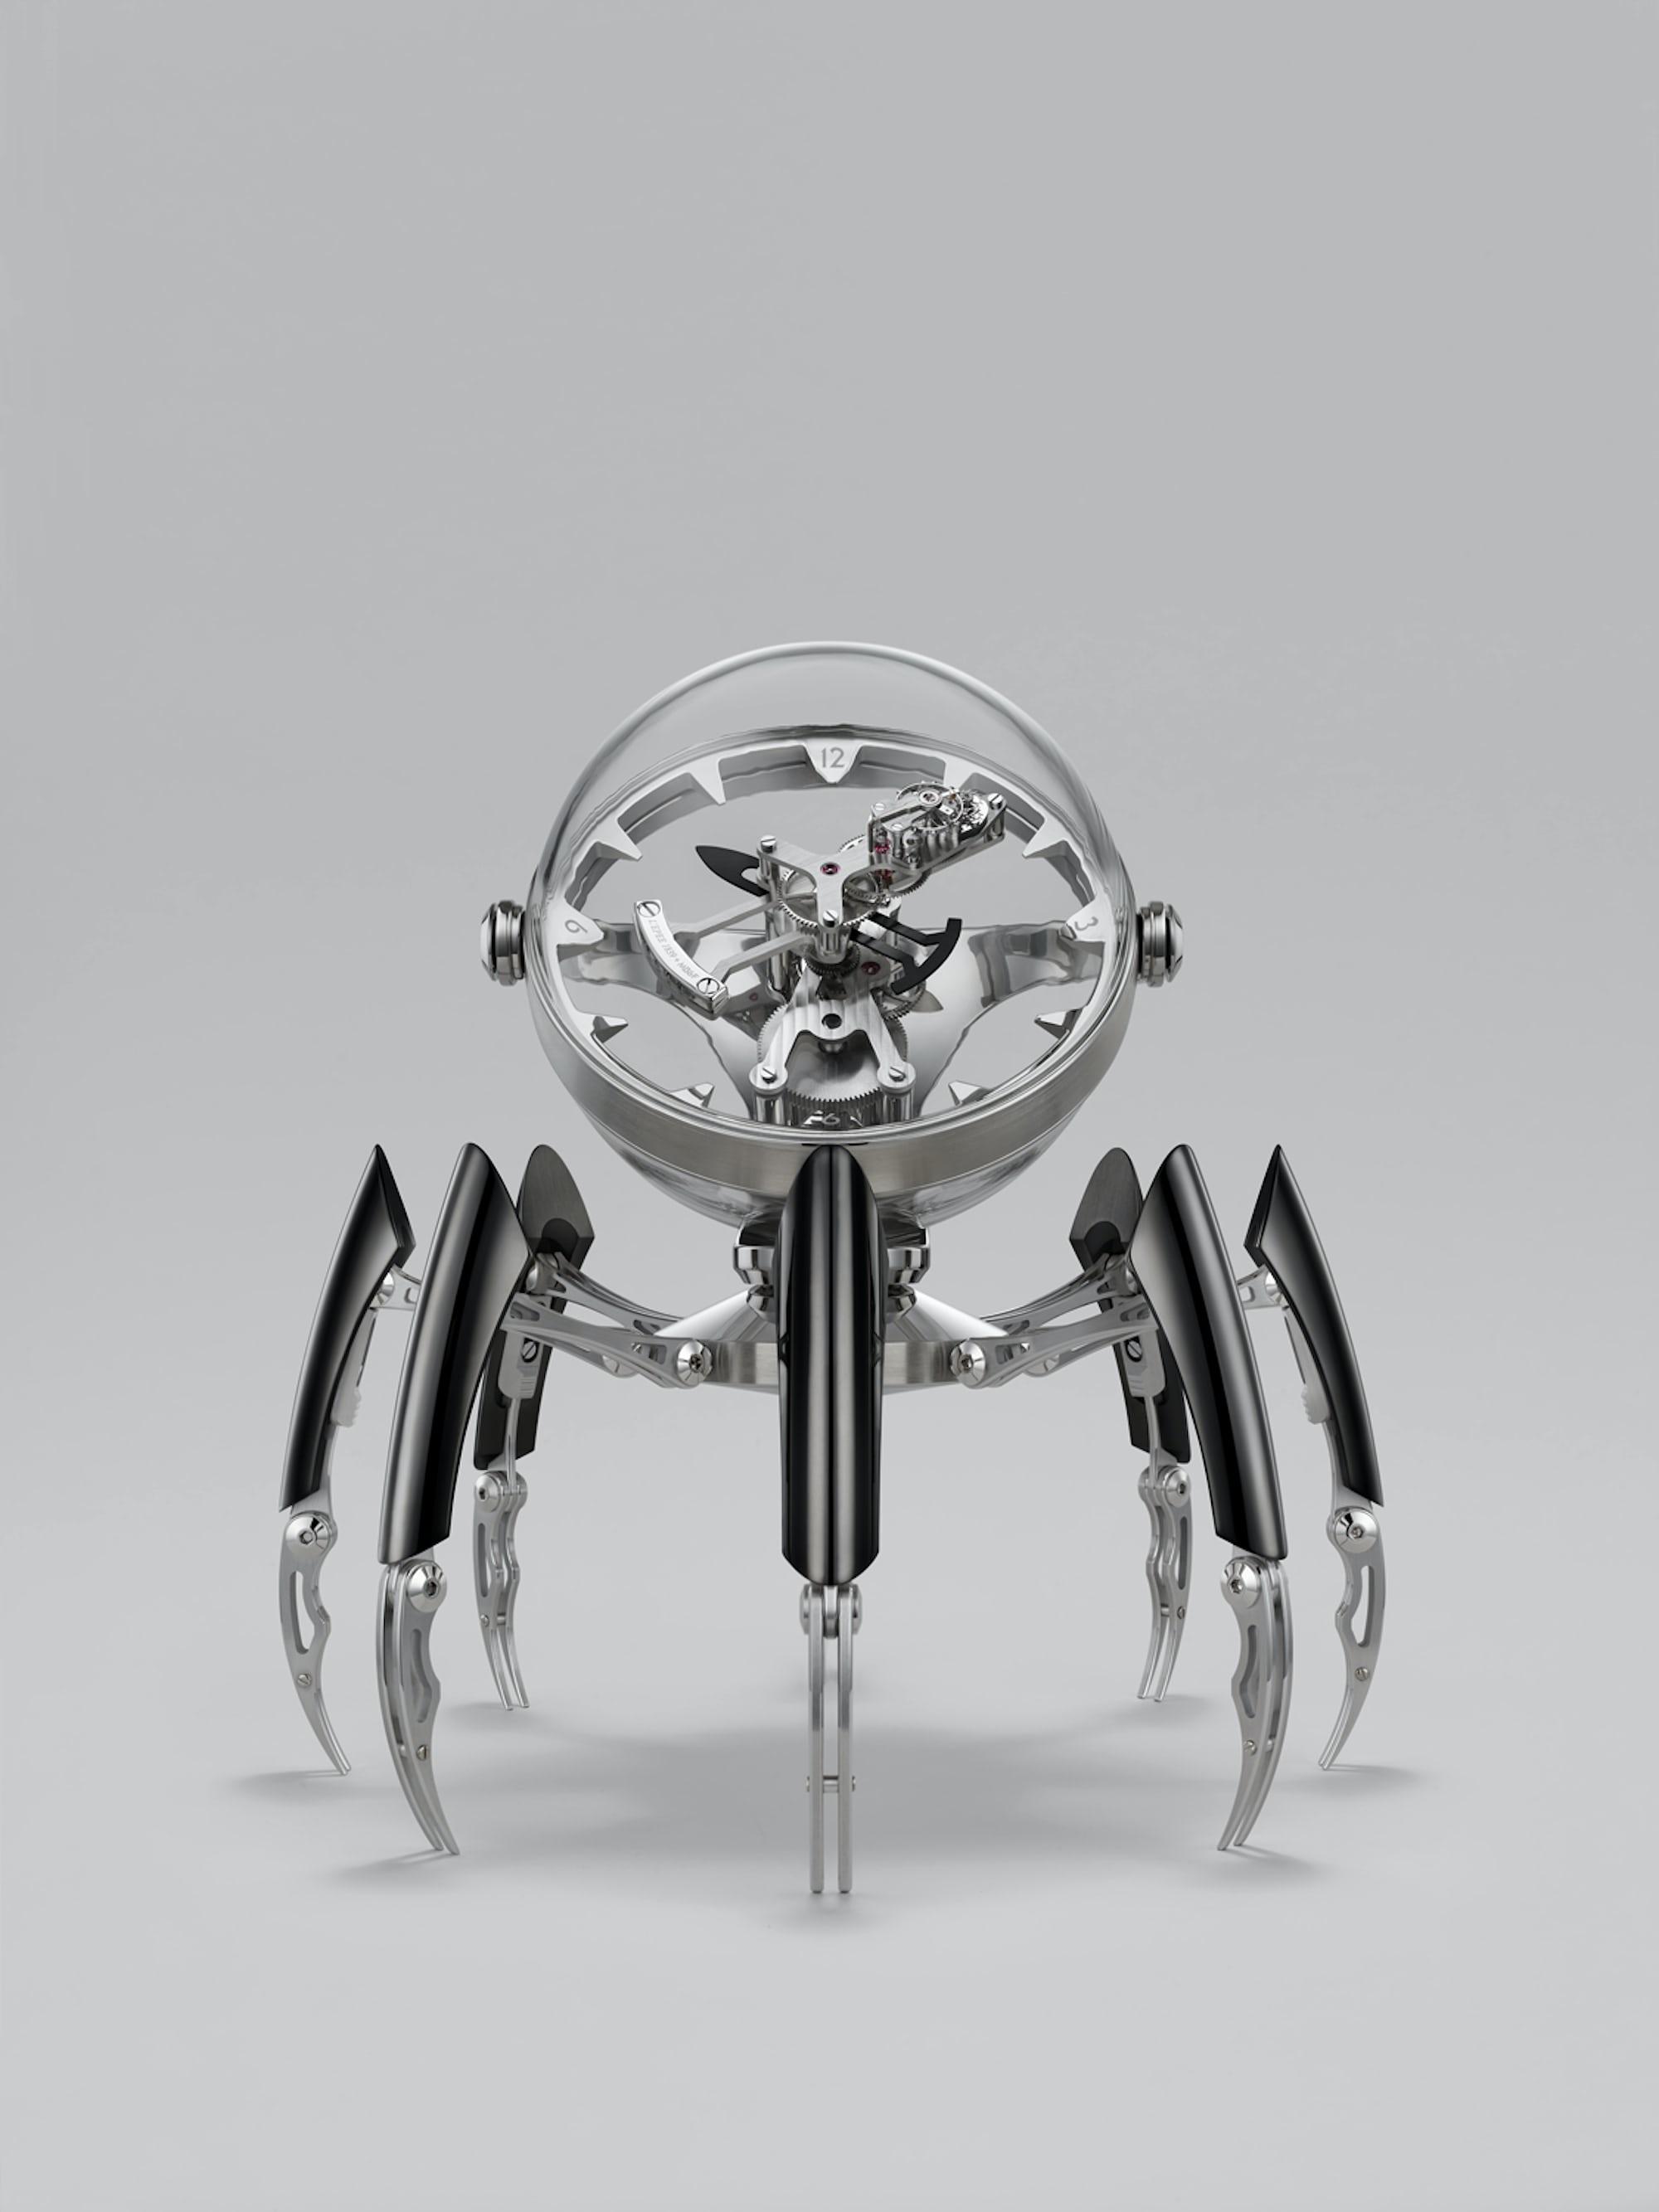 Black PVD version of the MB&F Octopod clock. Introducing: The MB&F And L'Epe 1839 Octopod Clock Introducing: The MB&F And L'Epe 1839 Octopod Clock Octopod Face Black LRES RGB